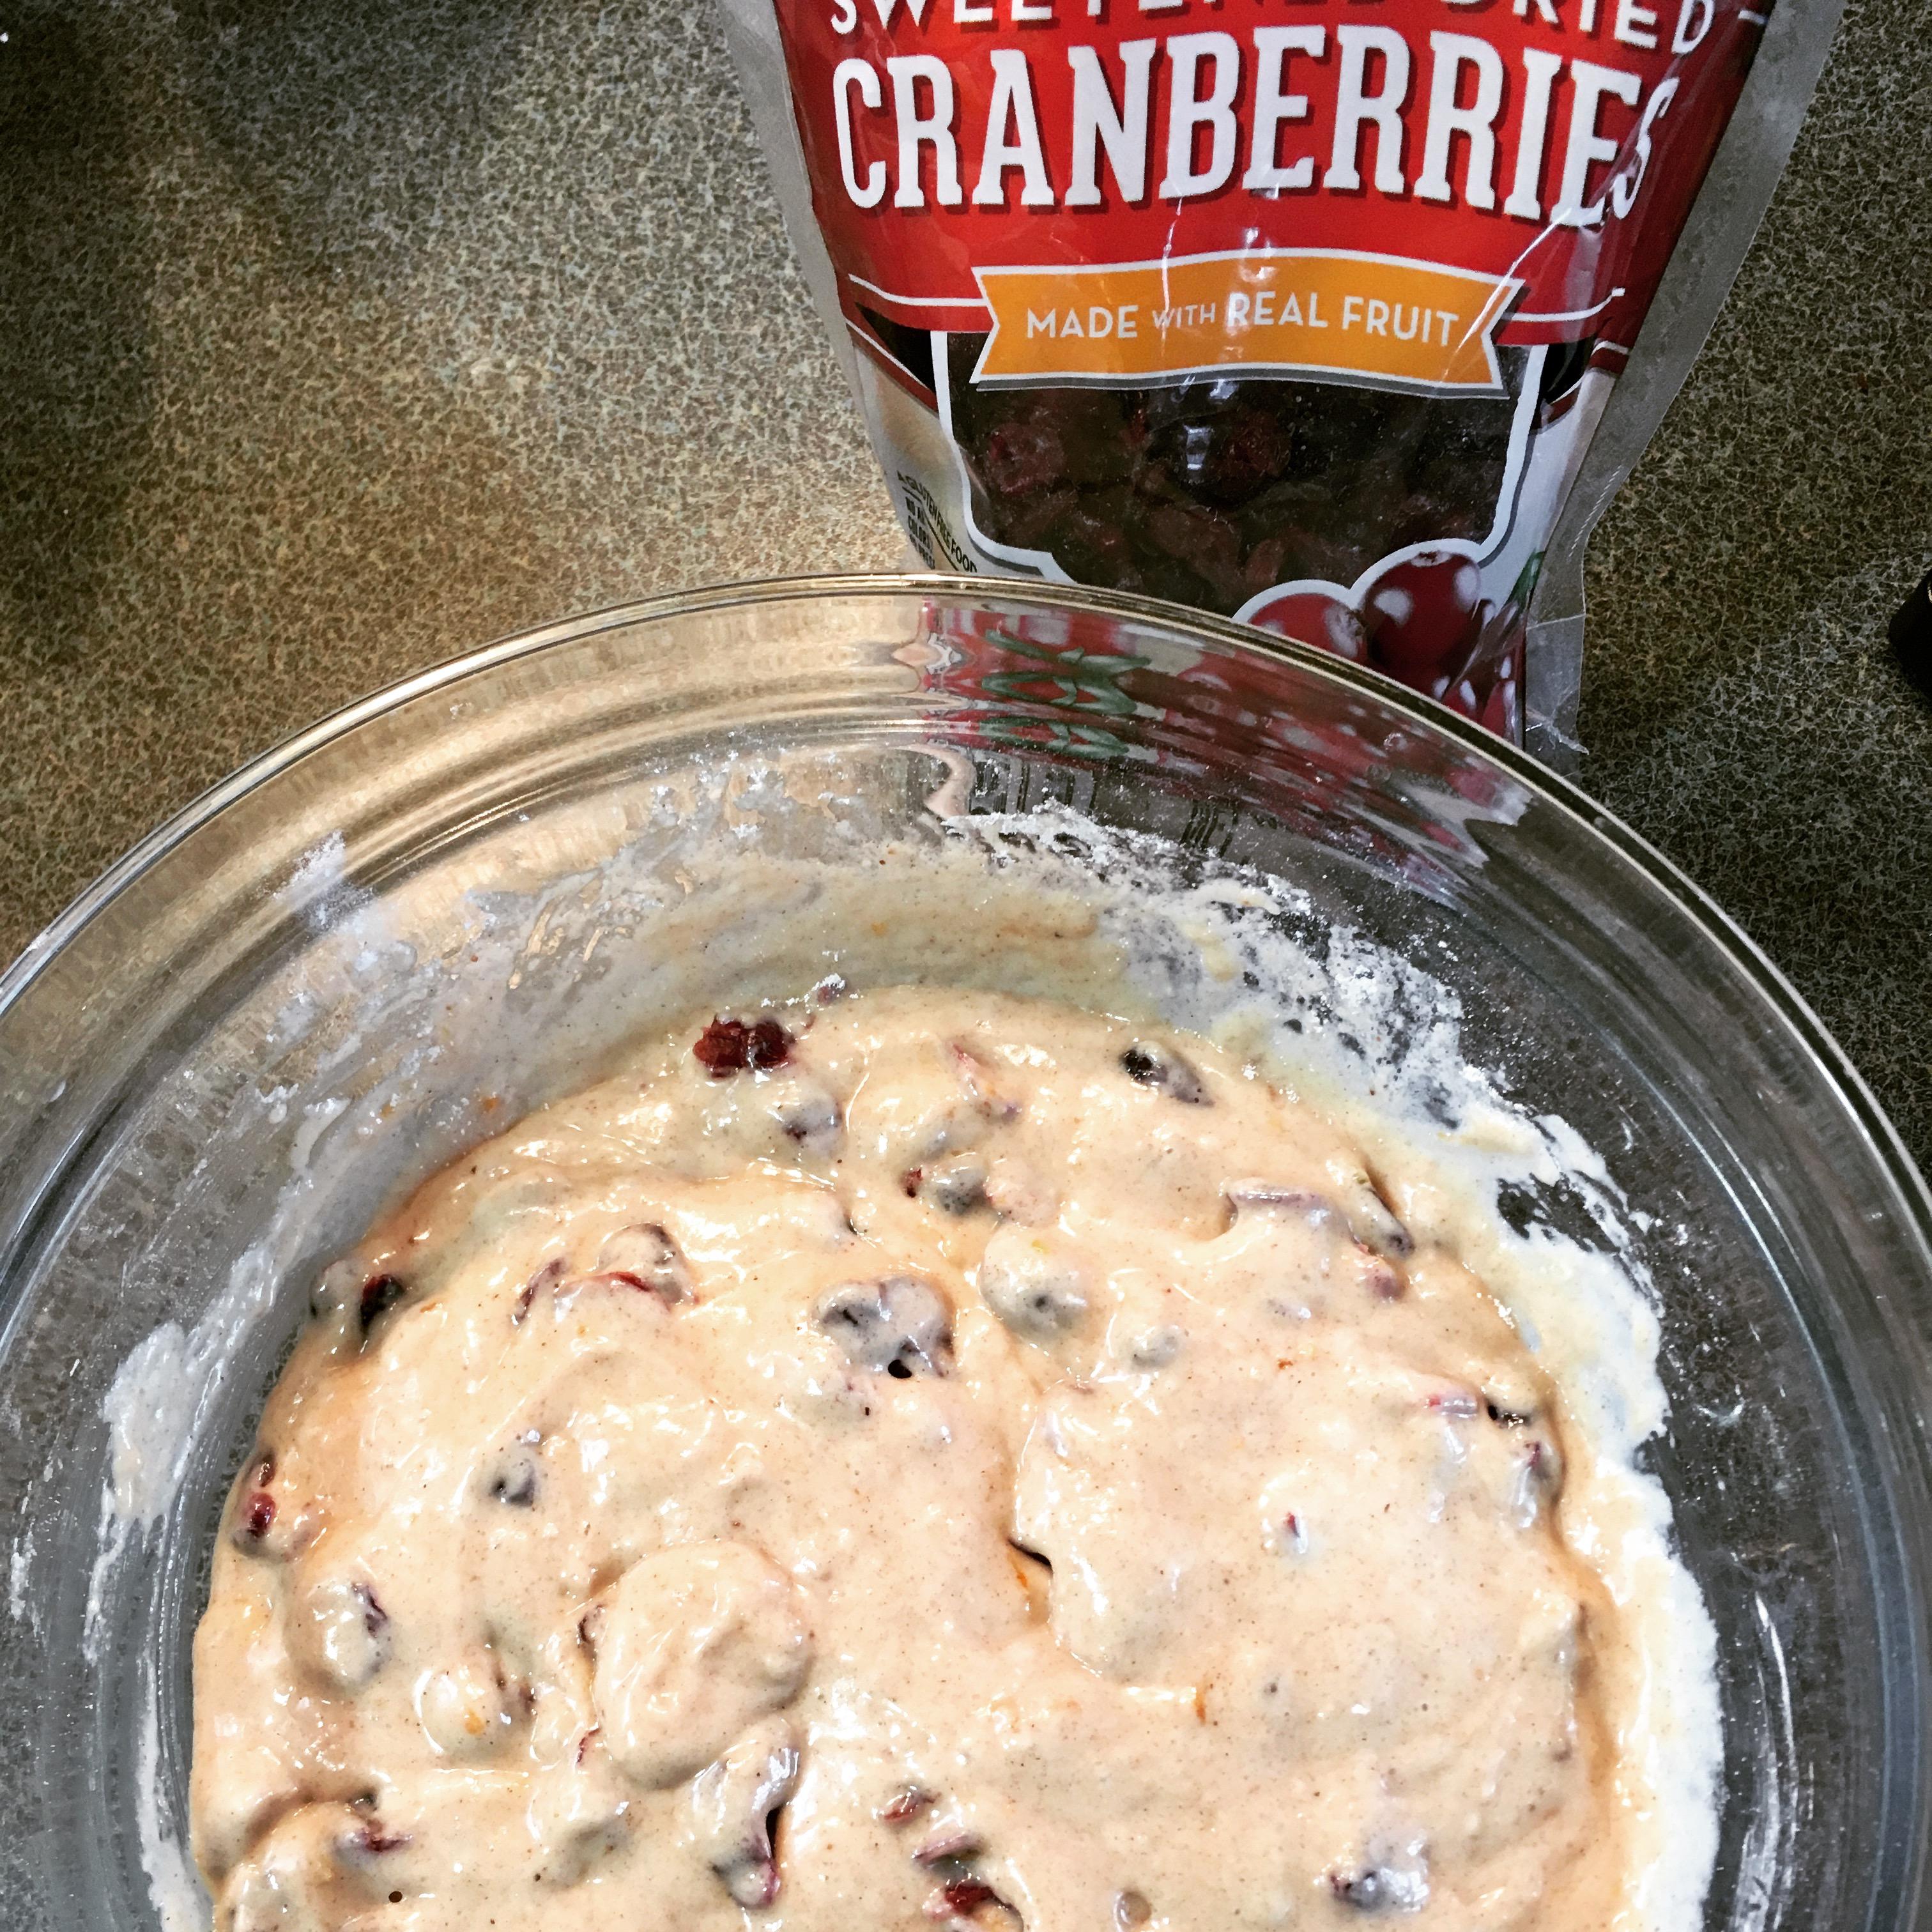 Cranberry Muffin Batter